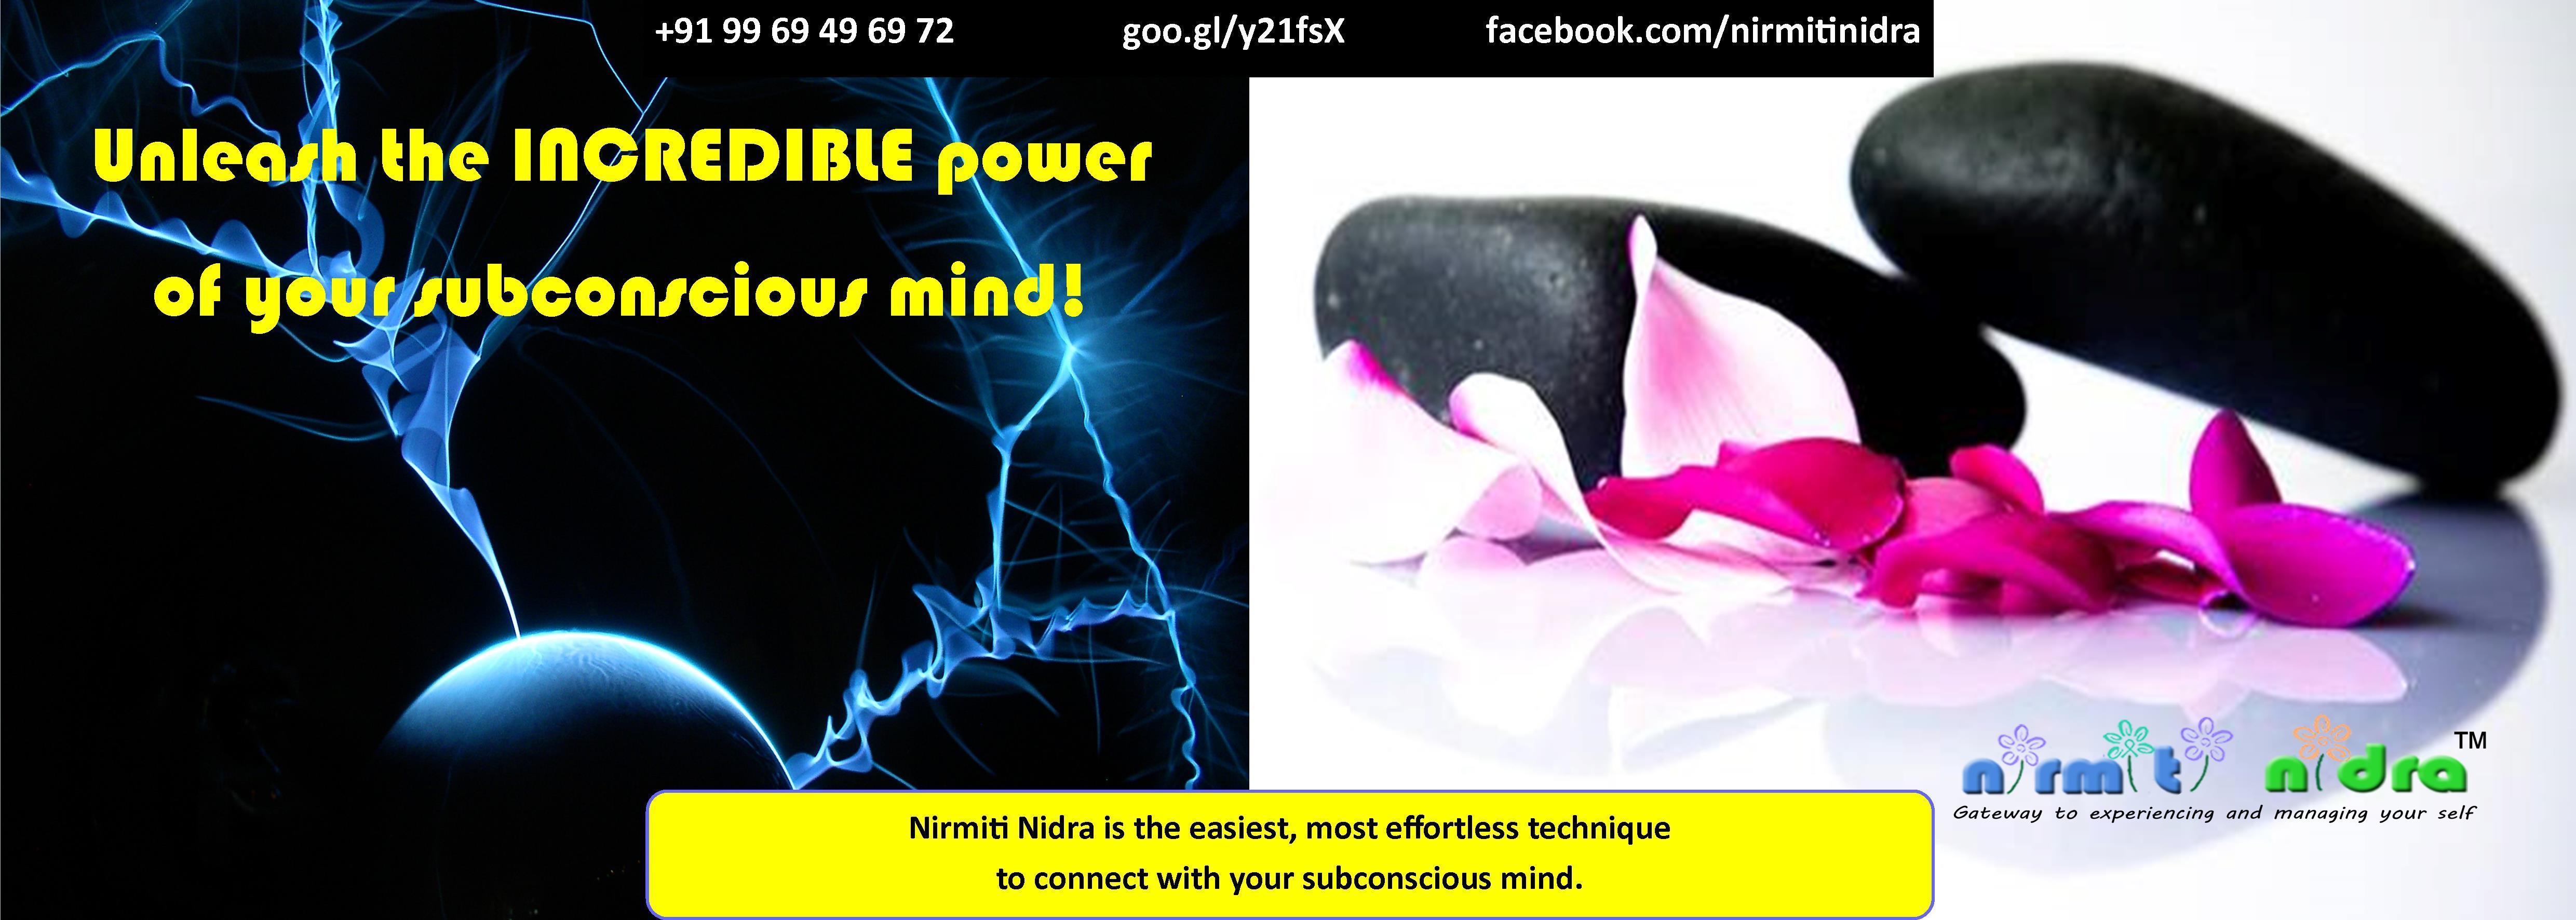 Nirmiti Nidra : Unleash the Incredible Force of Your Subconscious